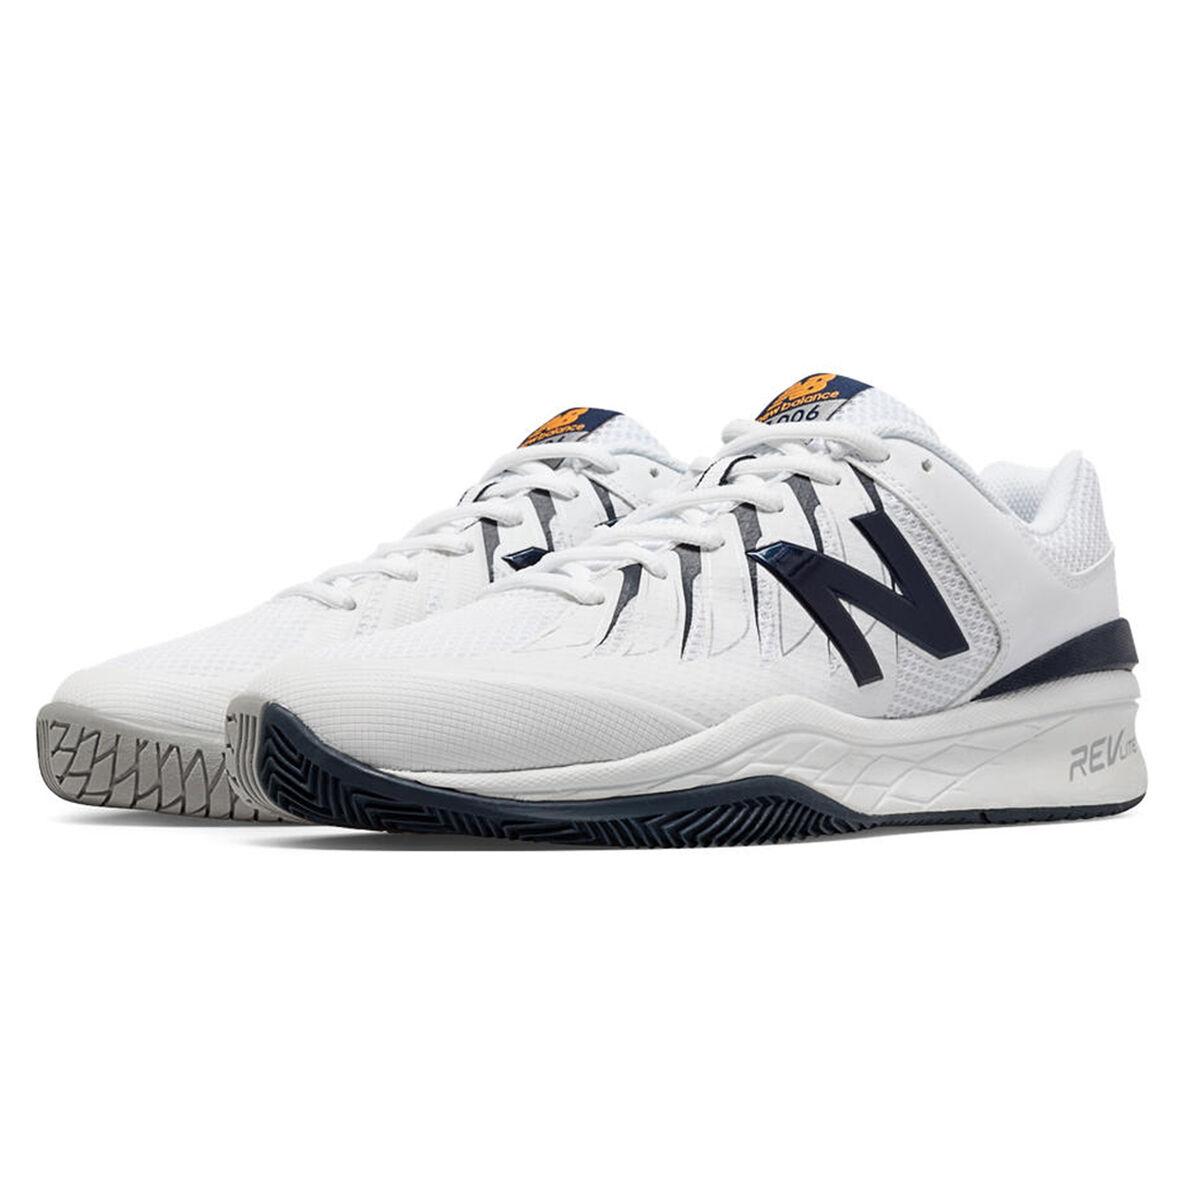 promo code 326f6 a0825 New Balance 1006 Men s Tennis Shoe - White Black